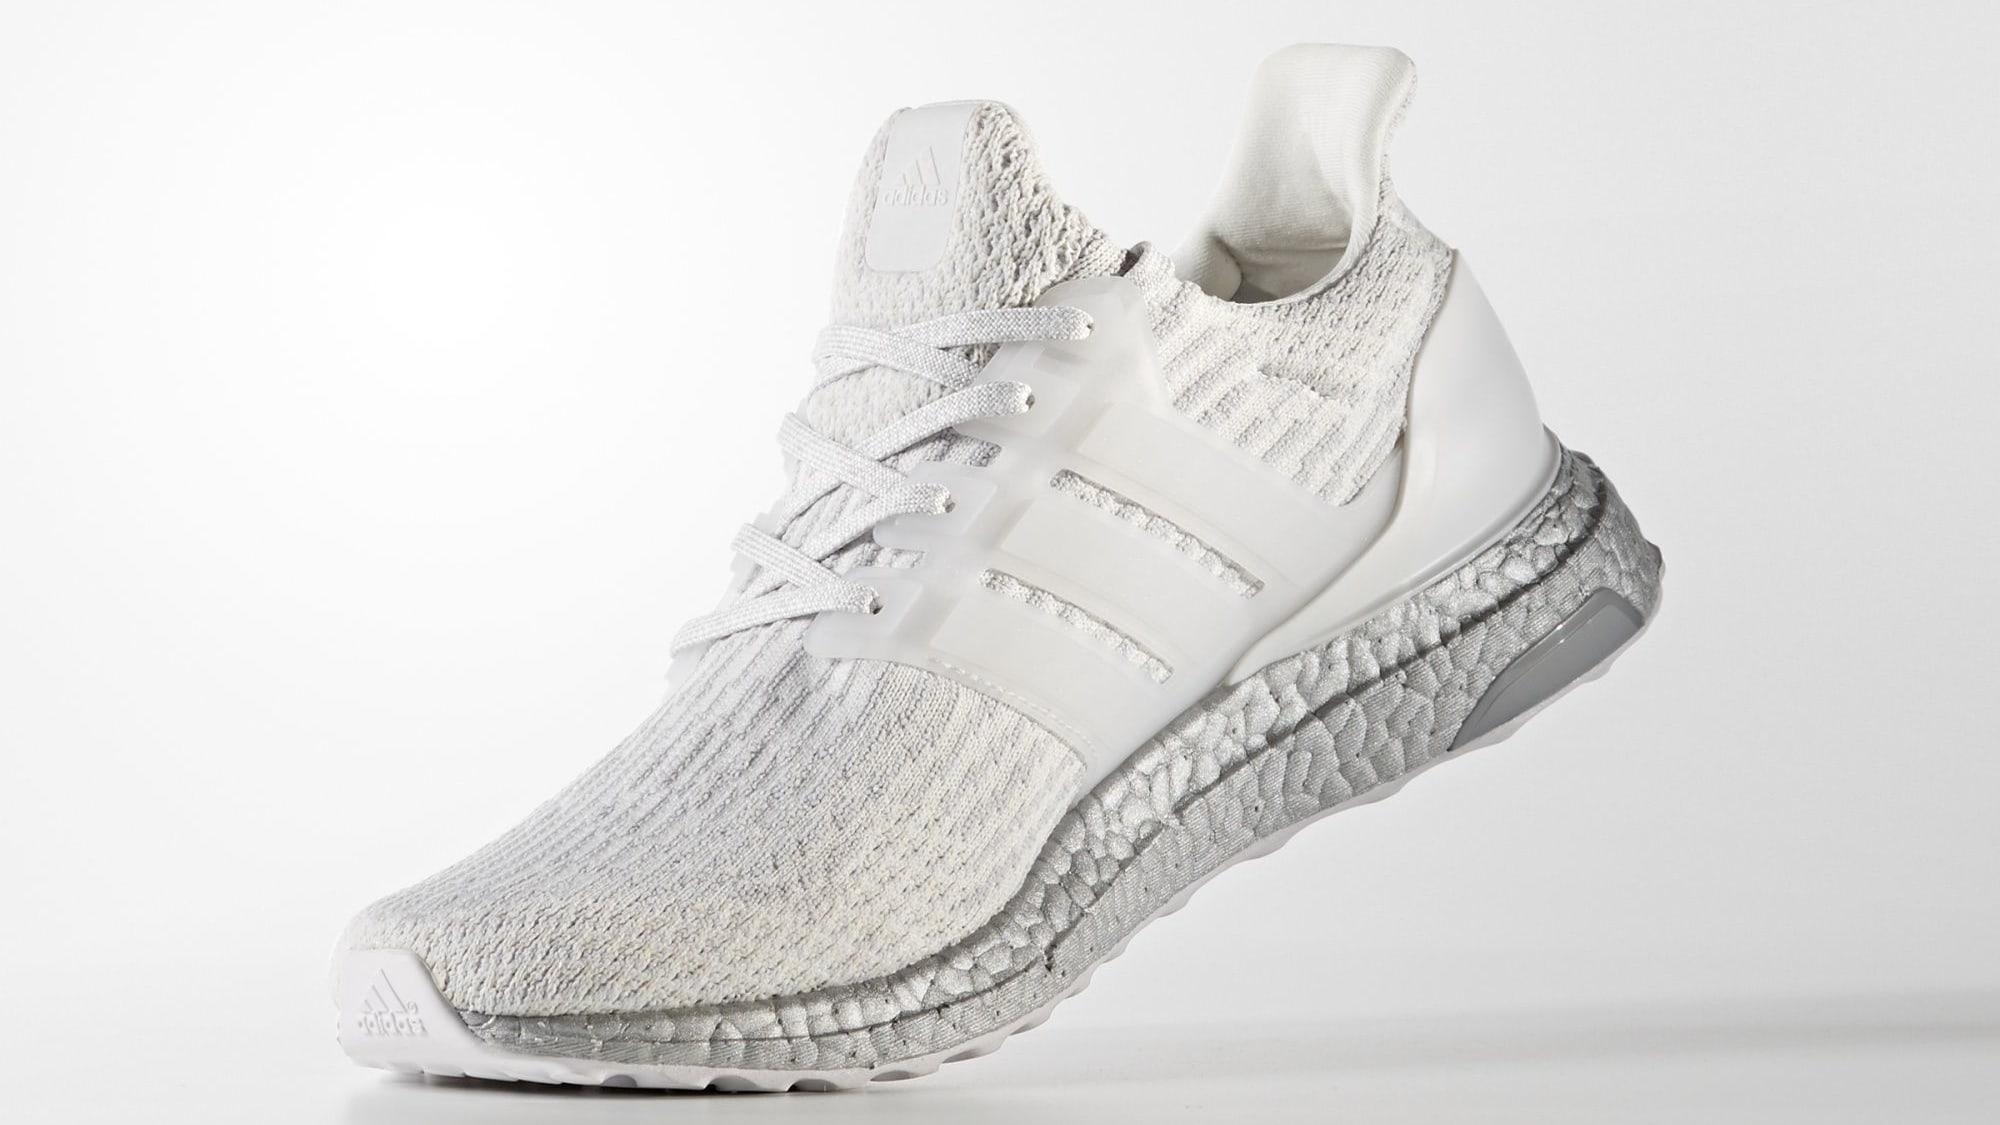 59288e264182e ... cheap image via adidas adidas ultra boost crystal white crystal white  grey ba8922 2a16b 443a1